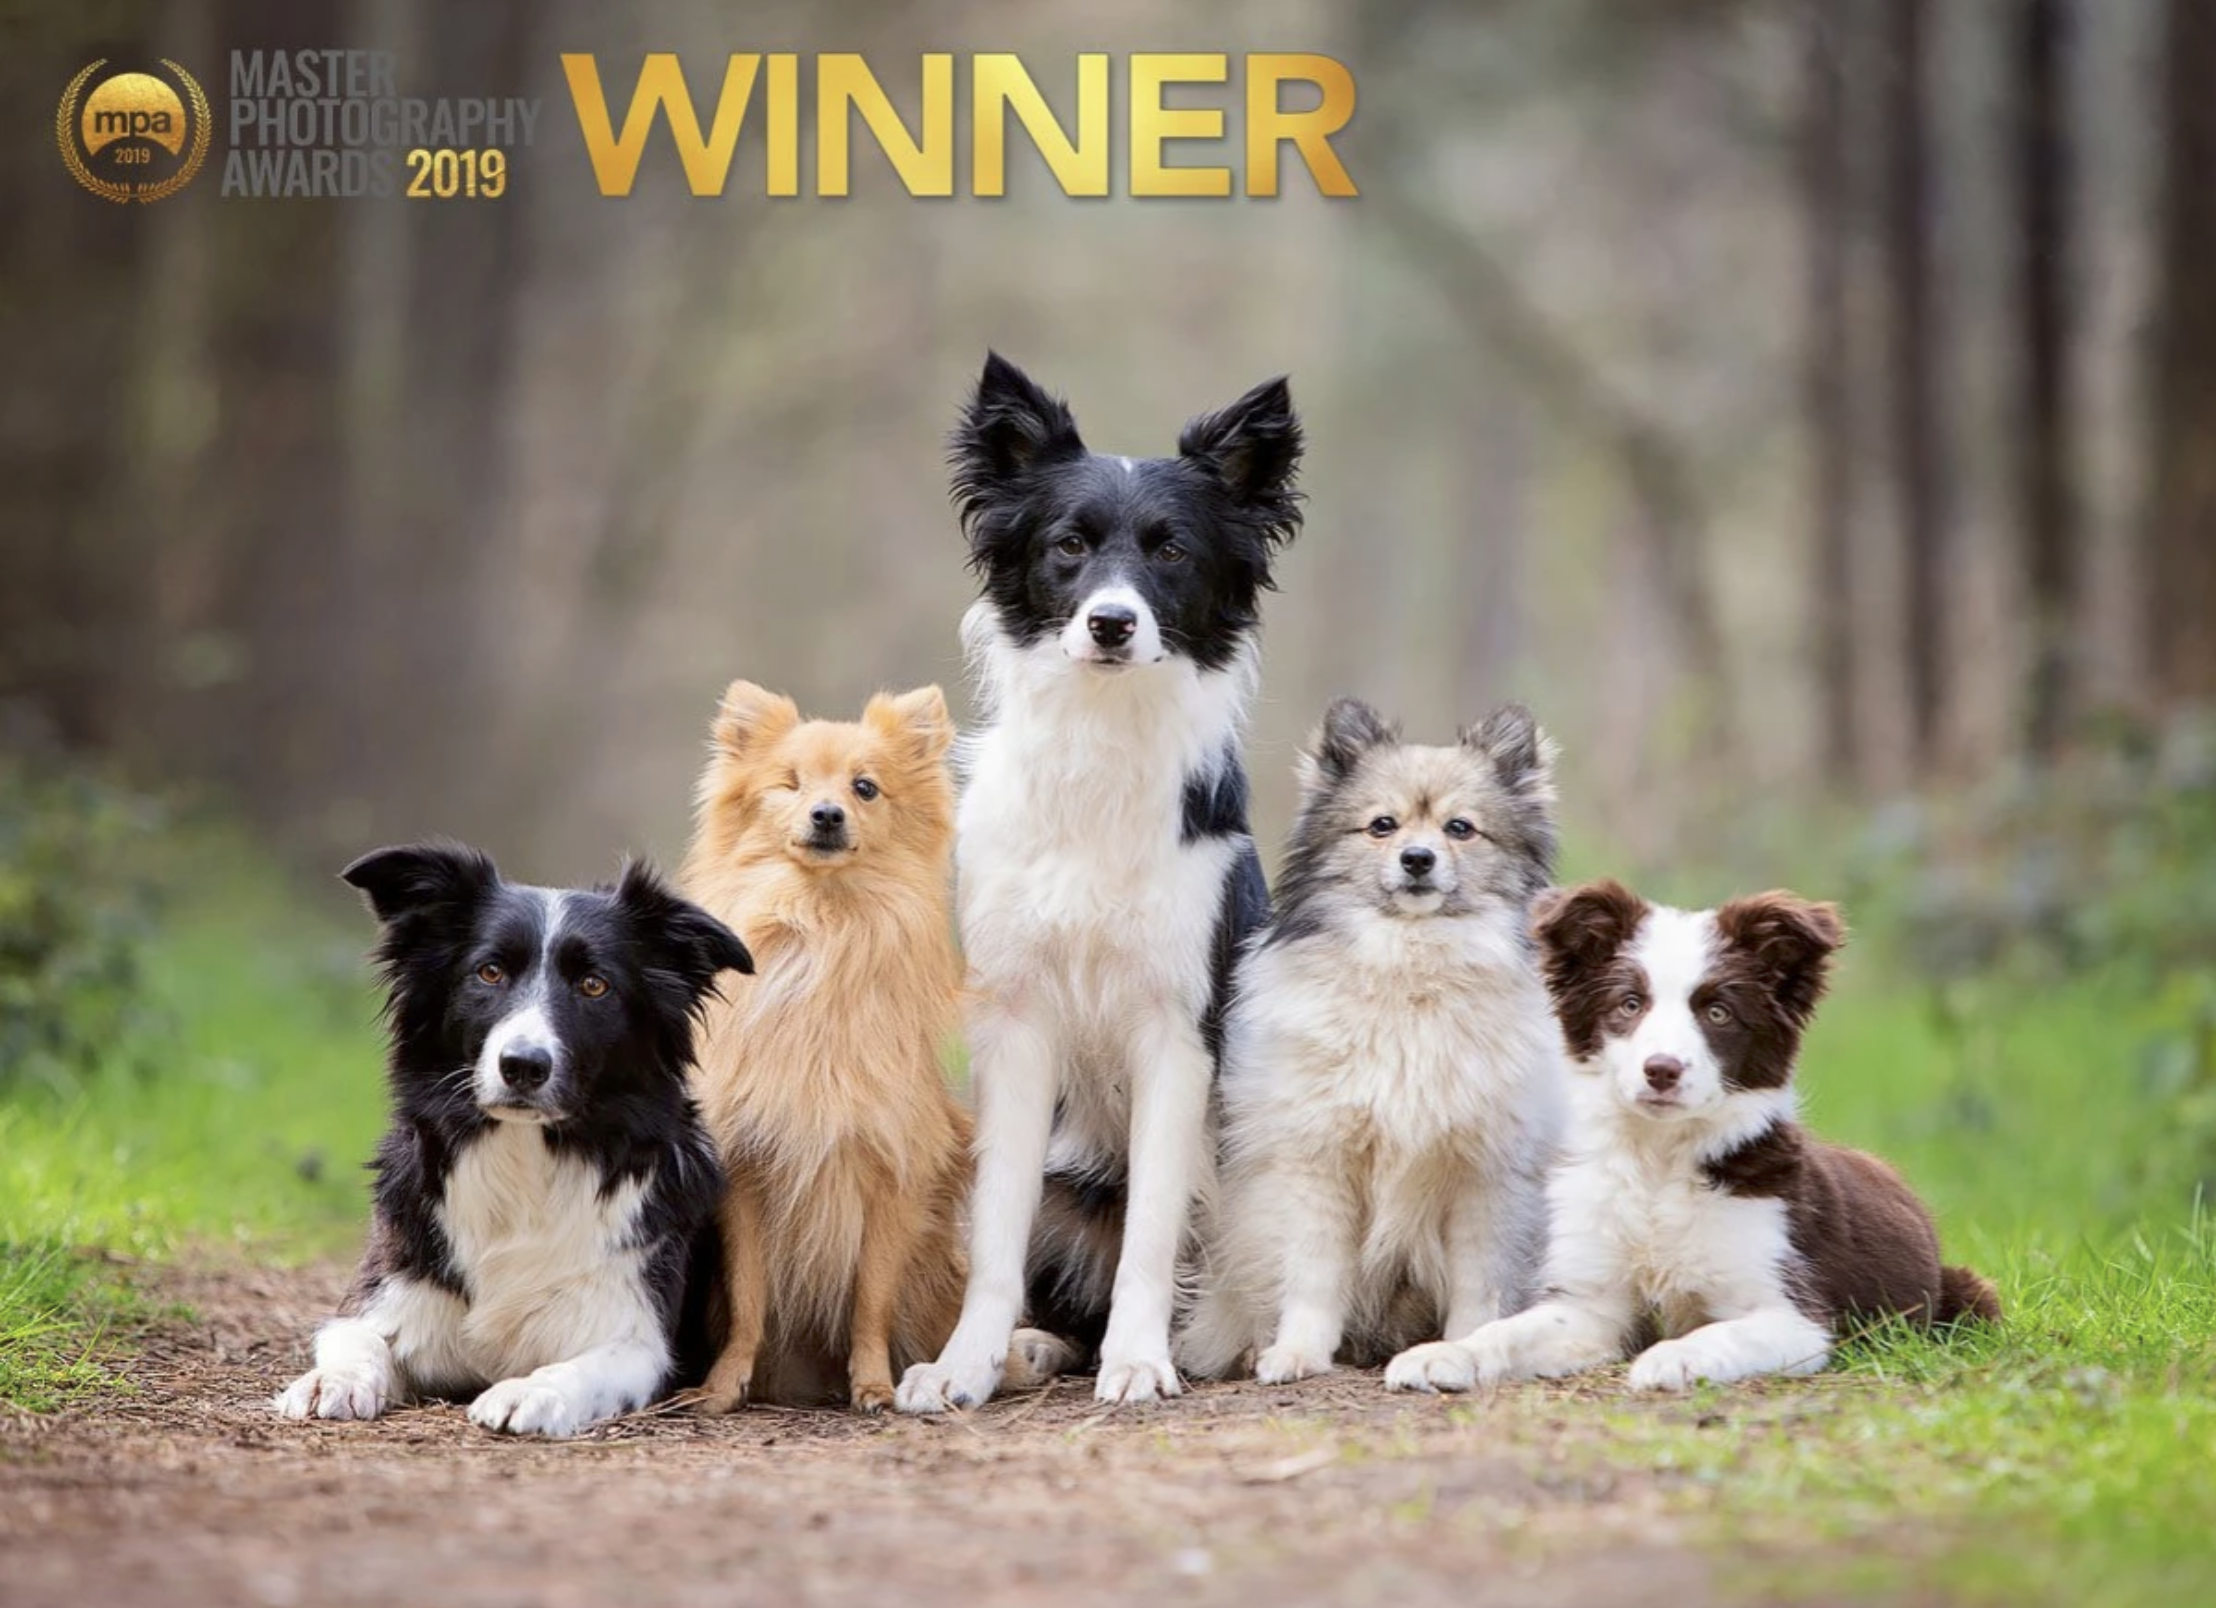 Master Photographer Awards